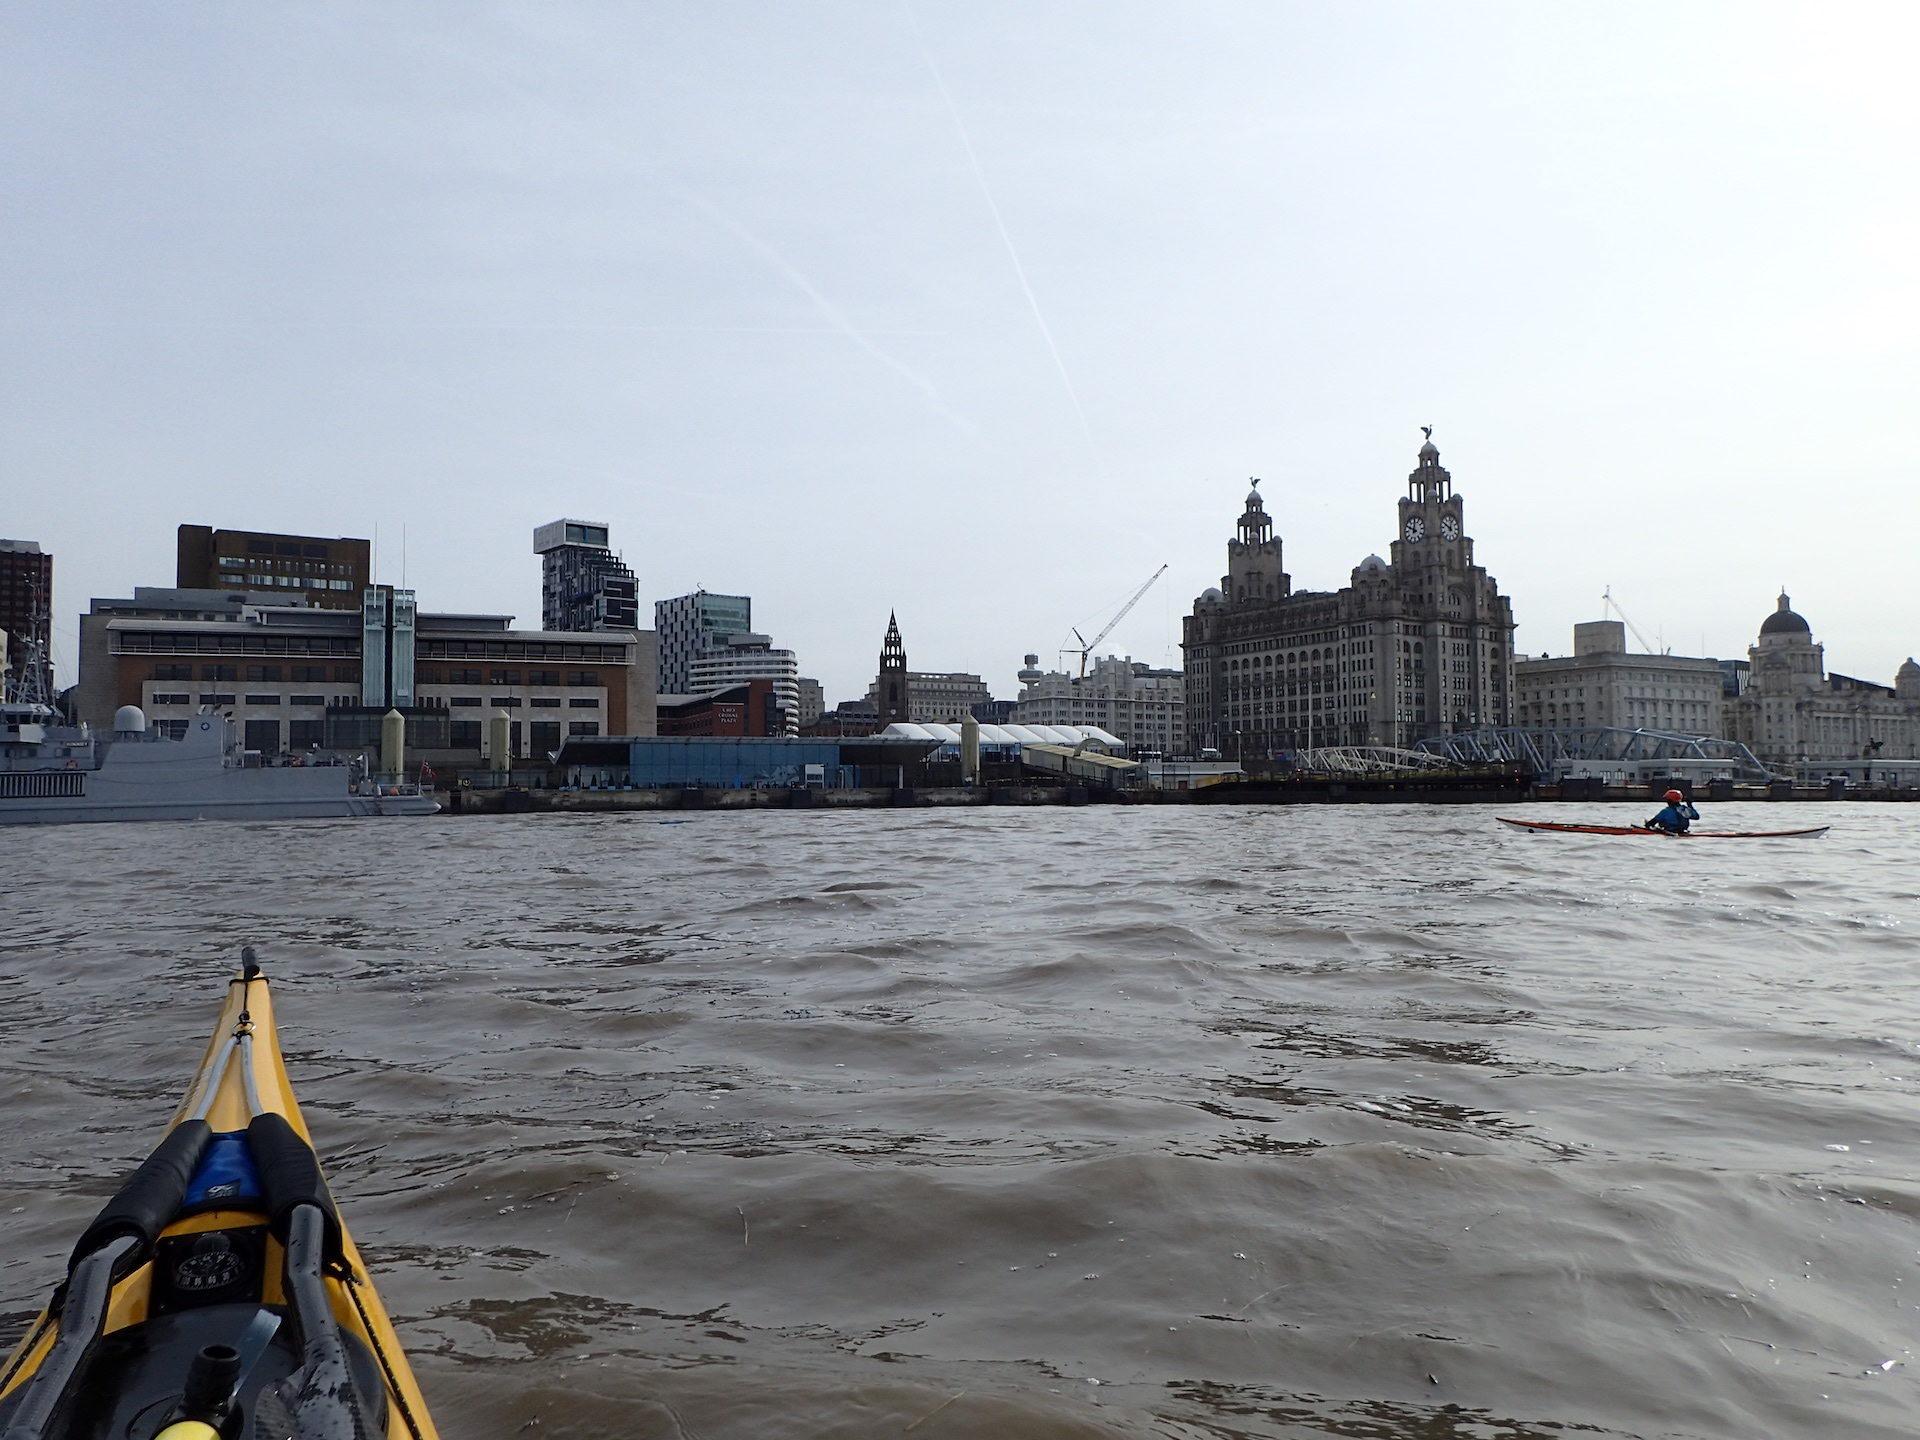 Ferrying across the Mersey